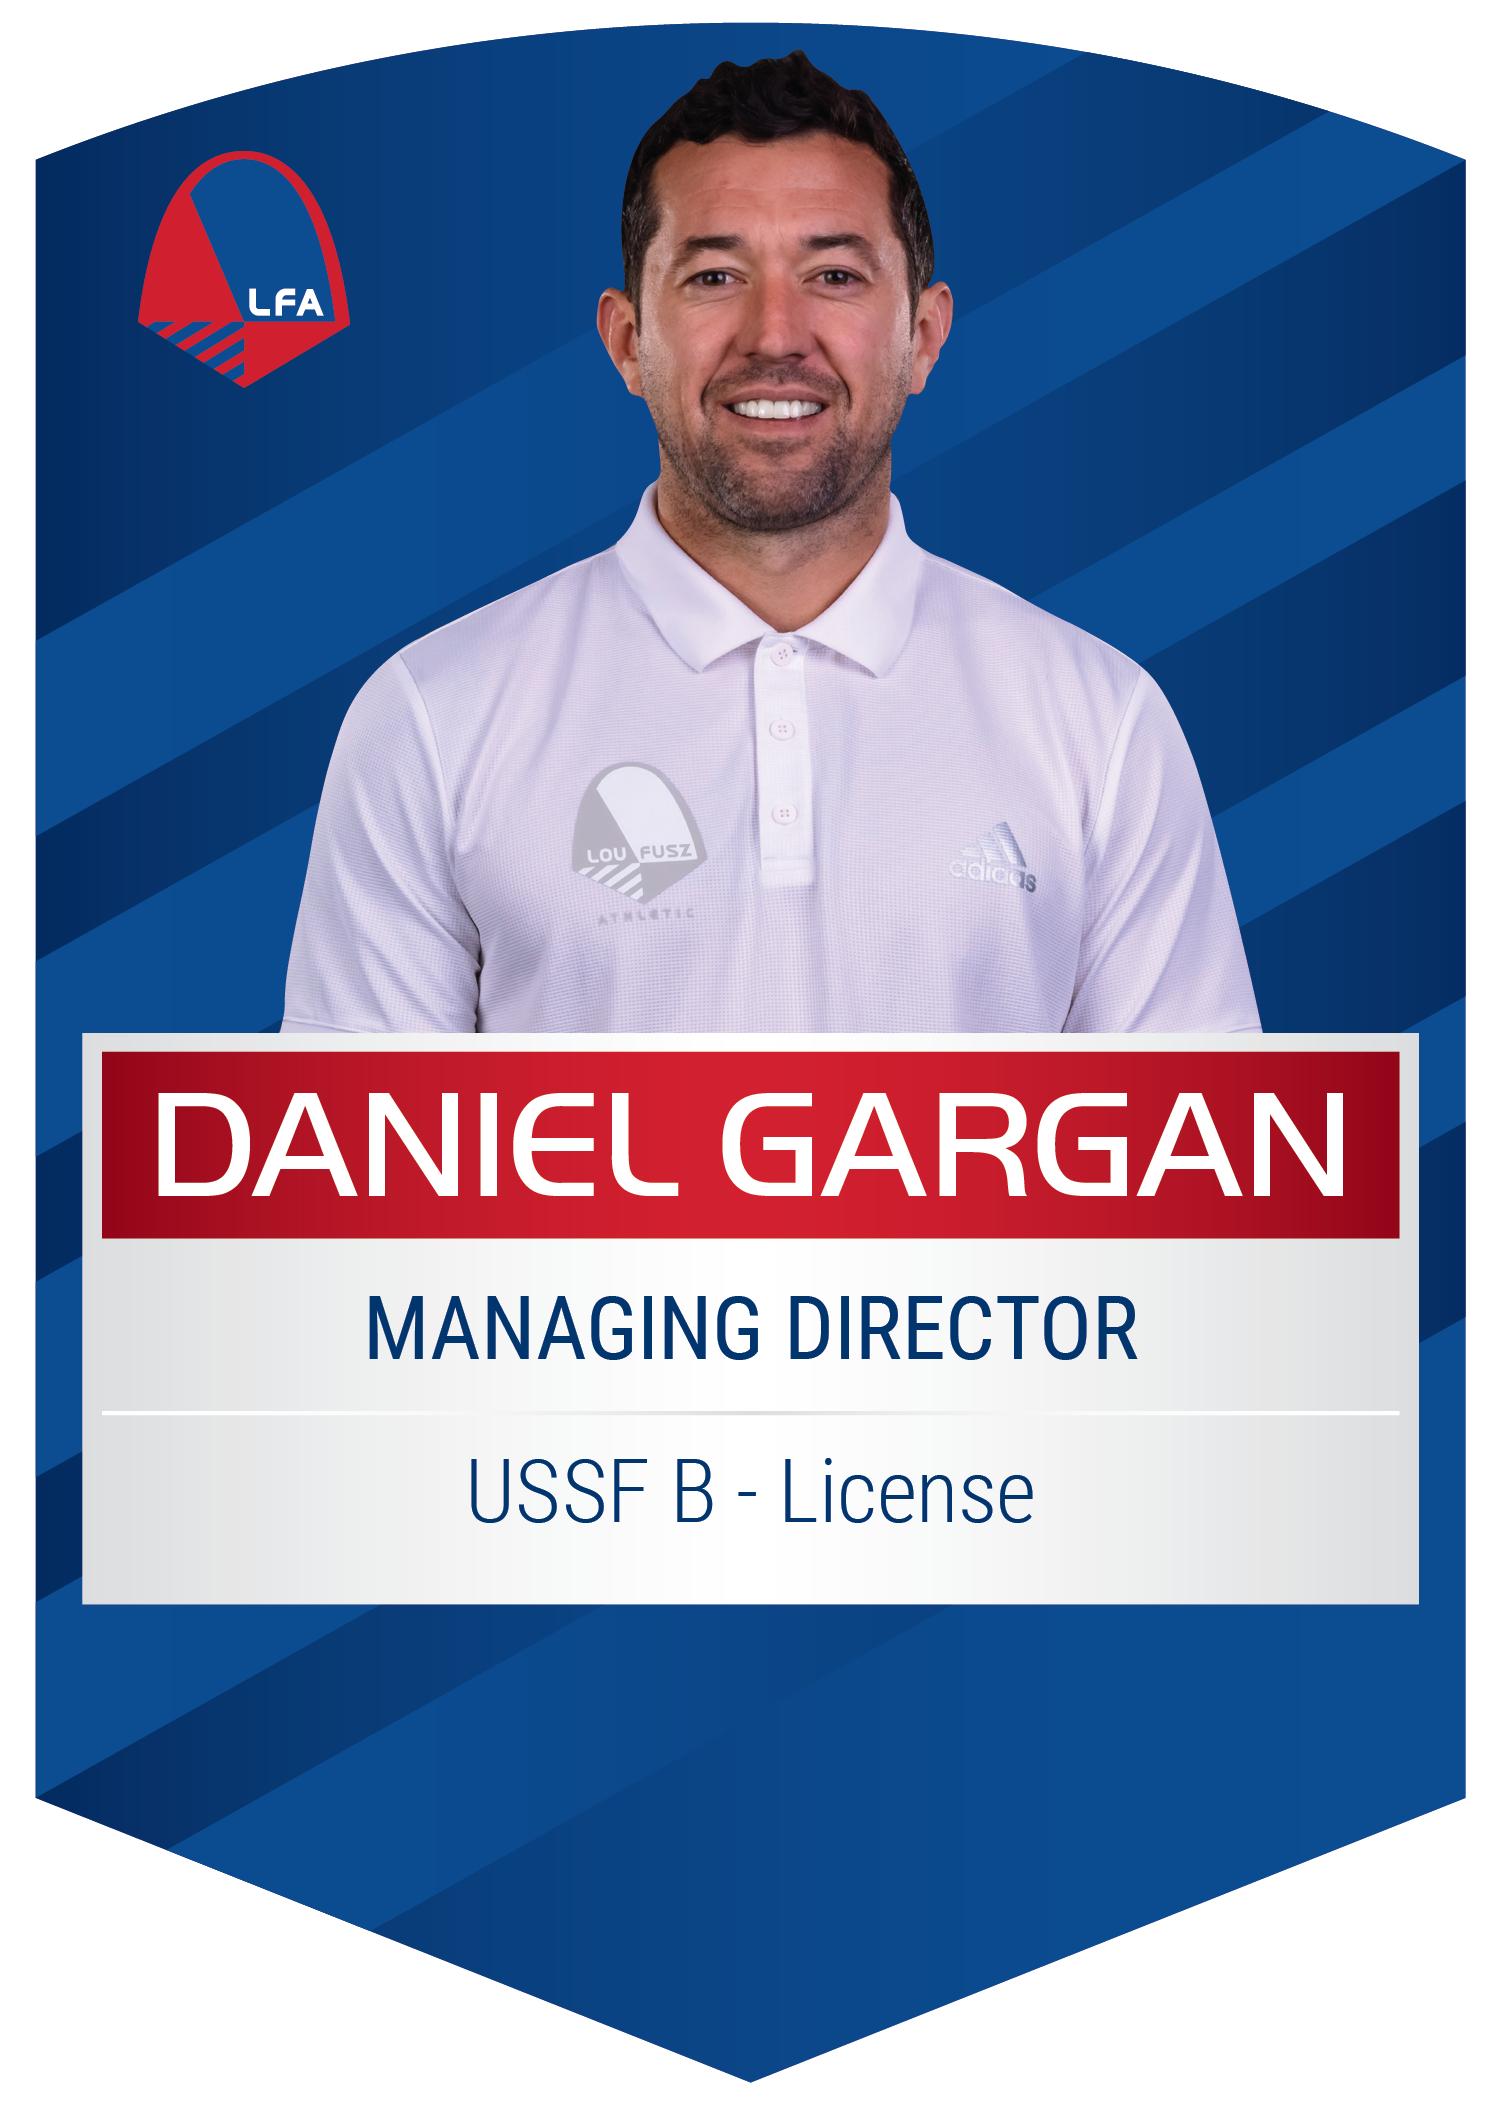 Daniel Gargan